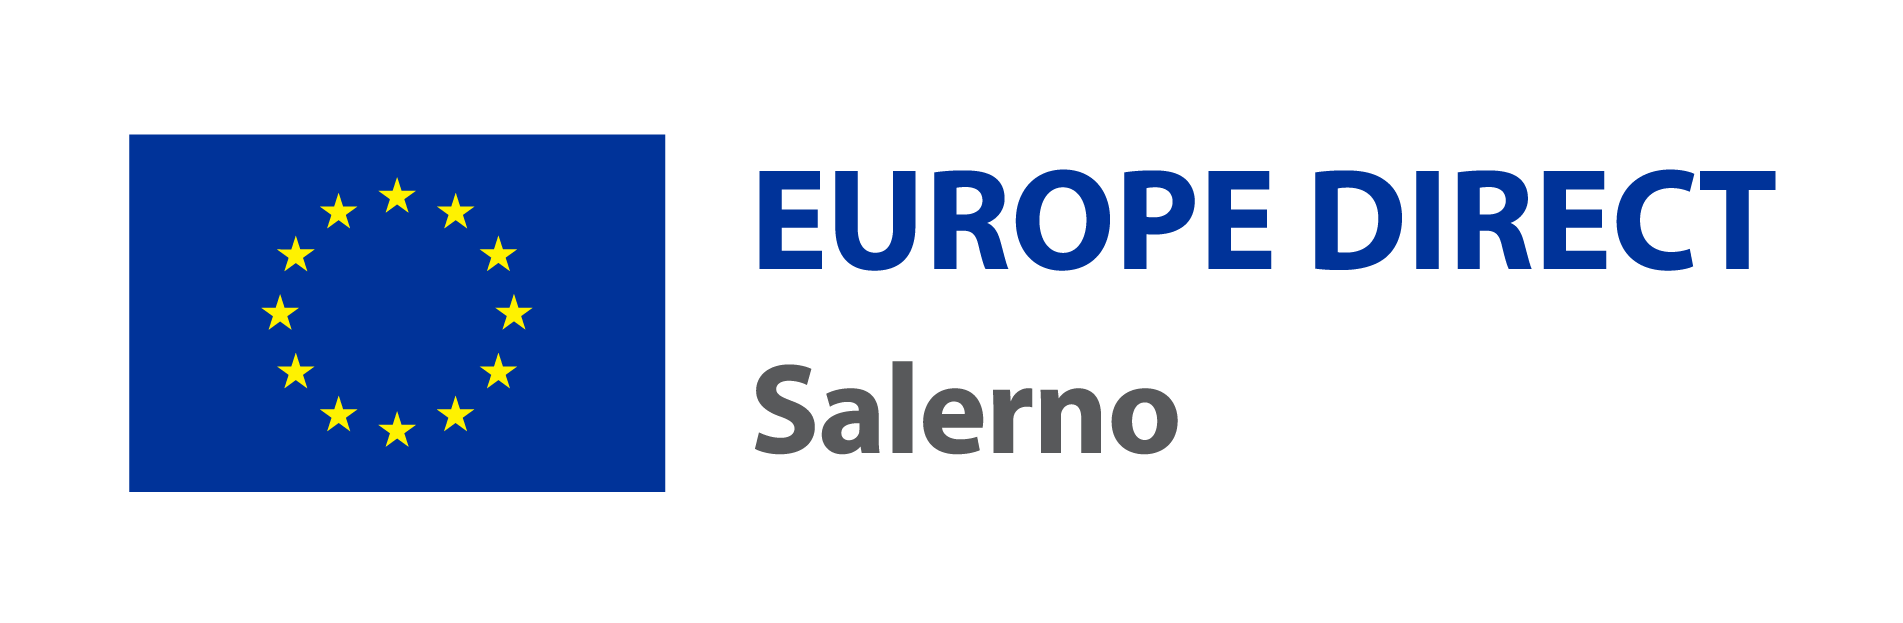 Europe Direct Salerno